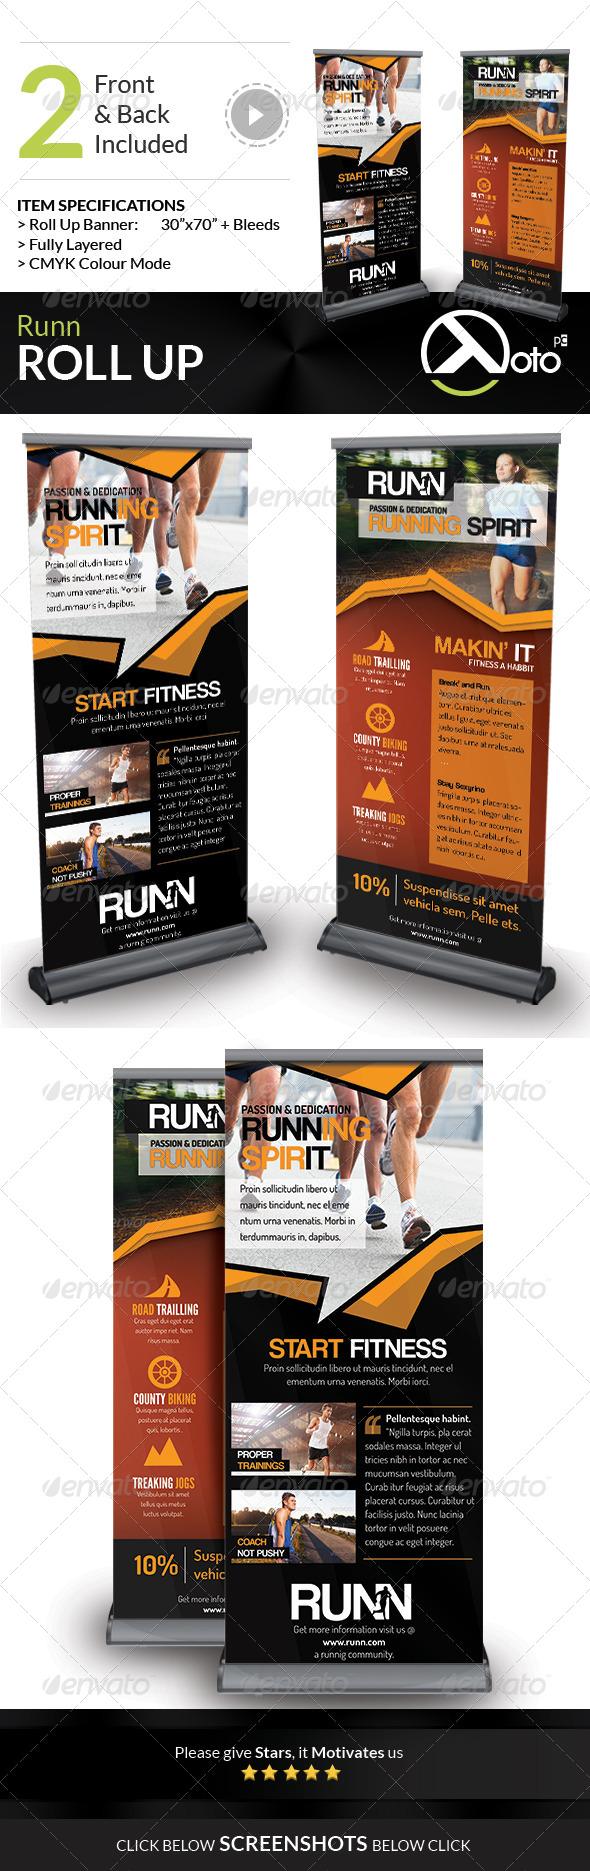 Runn Marathon Running Club Fitness Rollup Banners